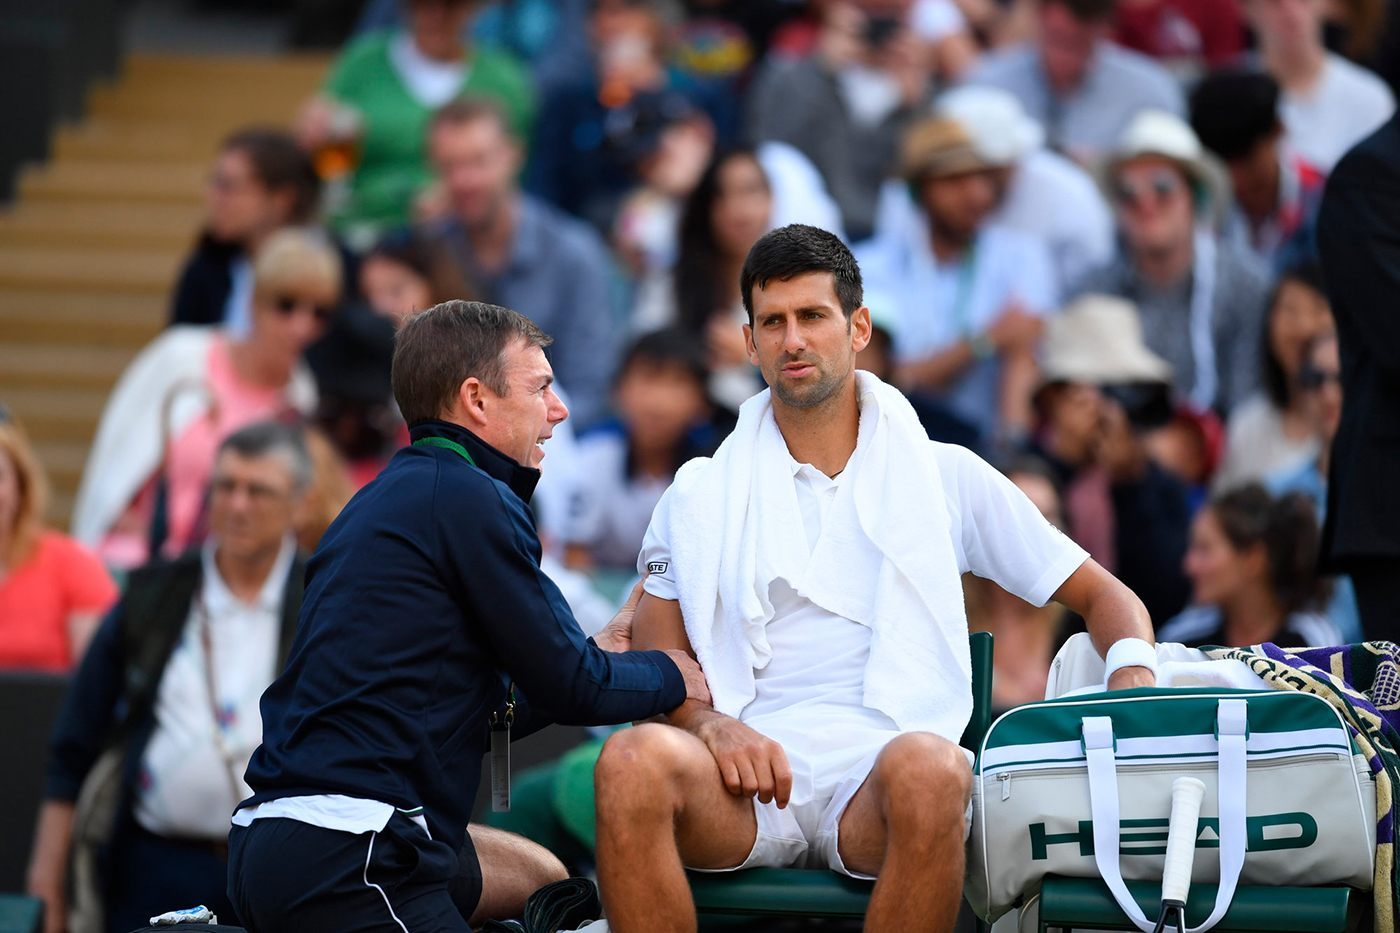 Djokovic lesión Wimbledon